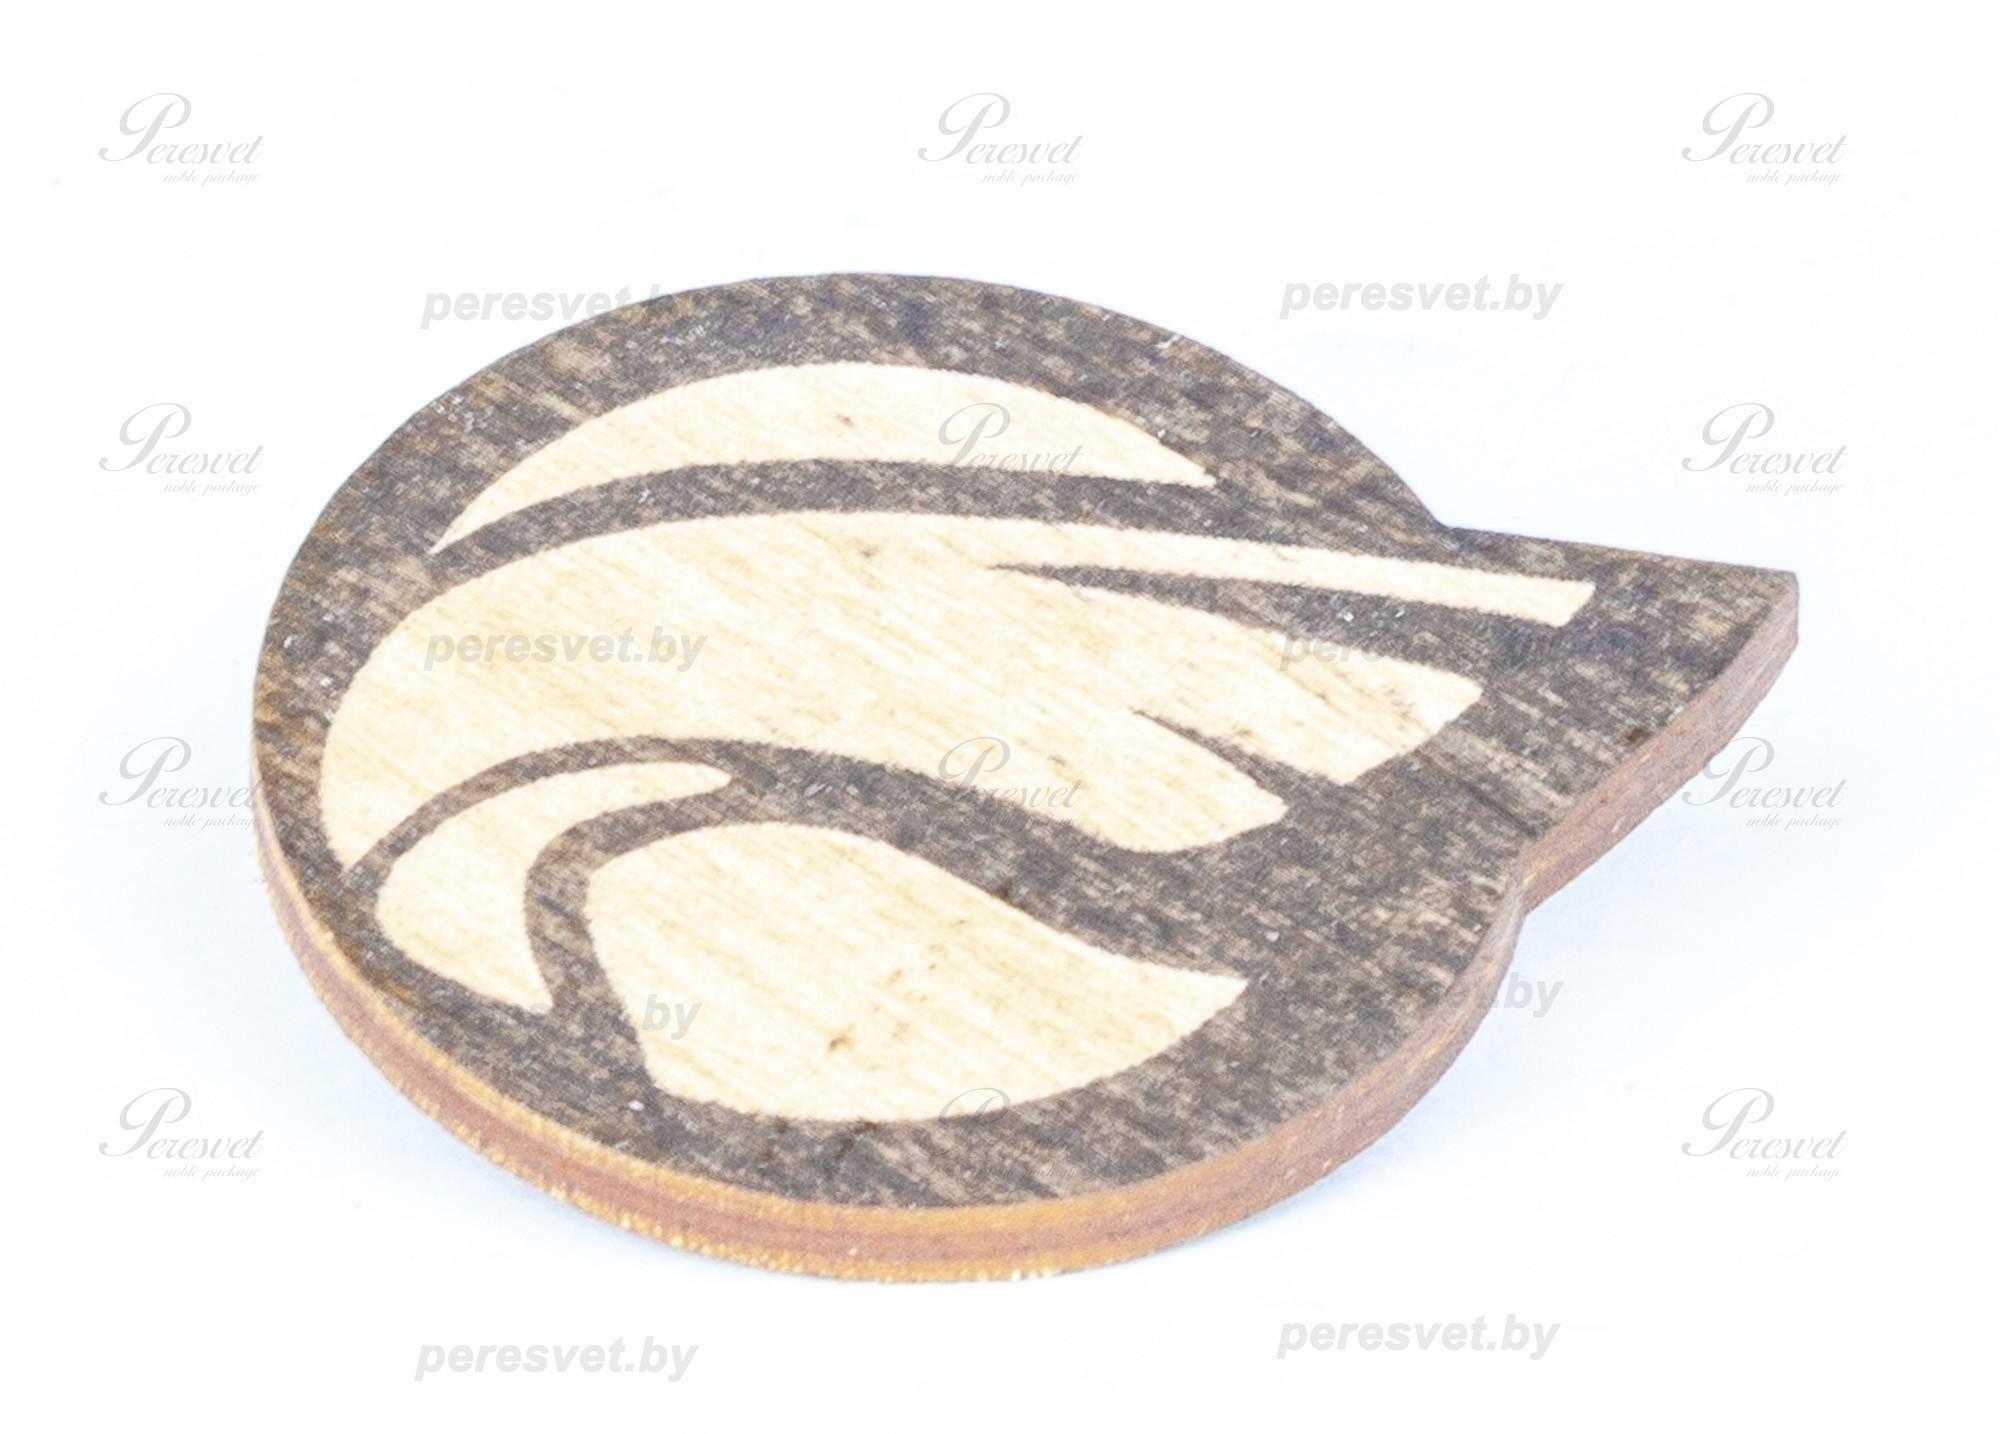 Значок Лого из дерева на застежке с гравировкой на peresvet.by